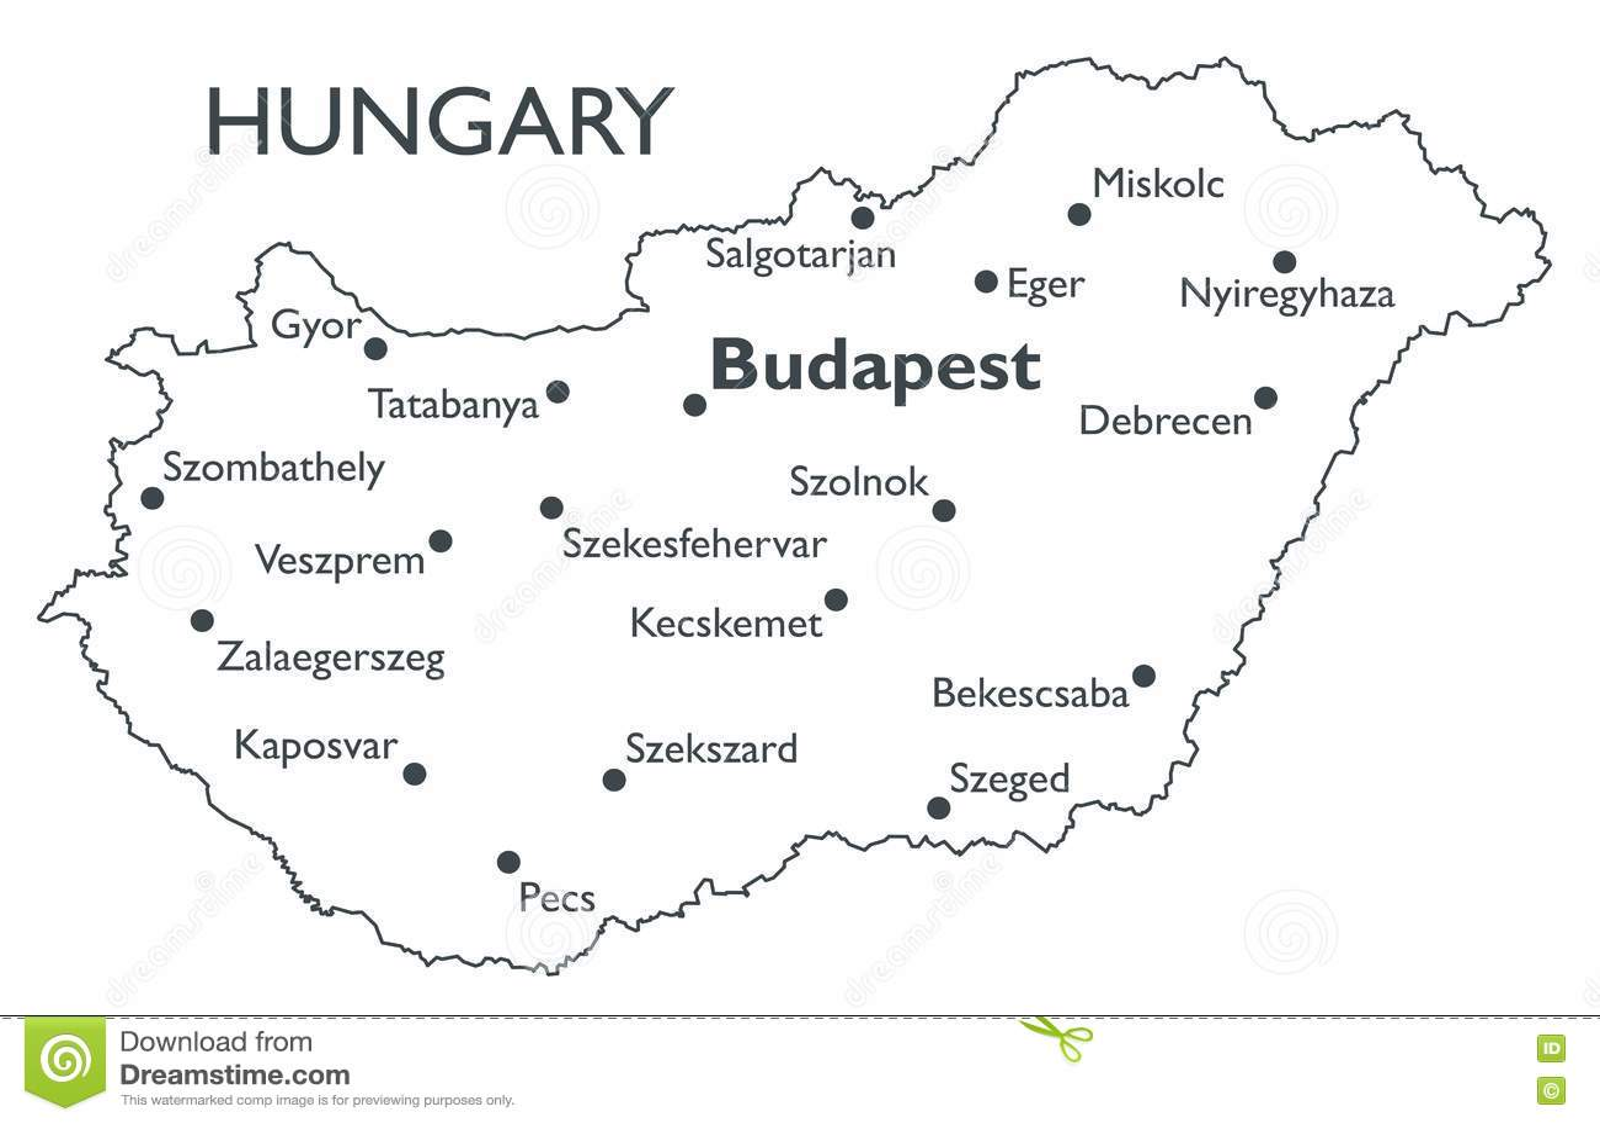 Vector map of Hungary stock vector. Illustration of szolnok ... on debrecen hungary map, sopron hungary map, kecskemet hungary map, szeged hungary map, budapest hungary map, pecs hungary map, ajka hungary map, bekescsaba hungary map, bratislava hungary map, vac hungary map, gyor hungary map, erd hungary map, papa hungary map, gyula hungary map, kaposvar hungary map, nyiregyhaza hungary map, pest hungary map, hungary on world map, magyar hungary map,